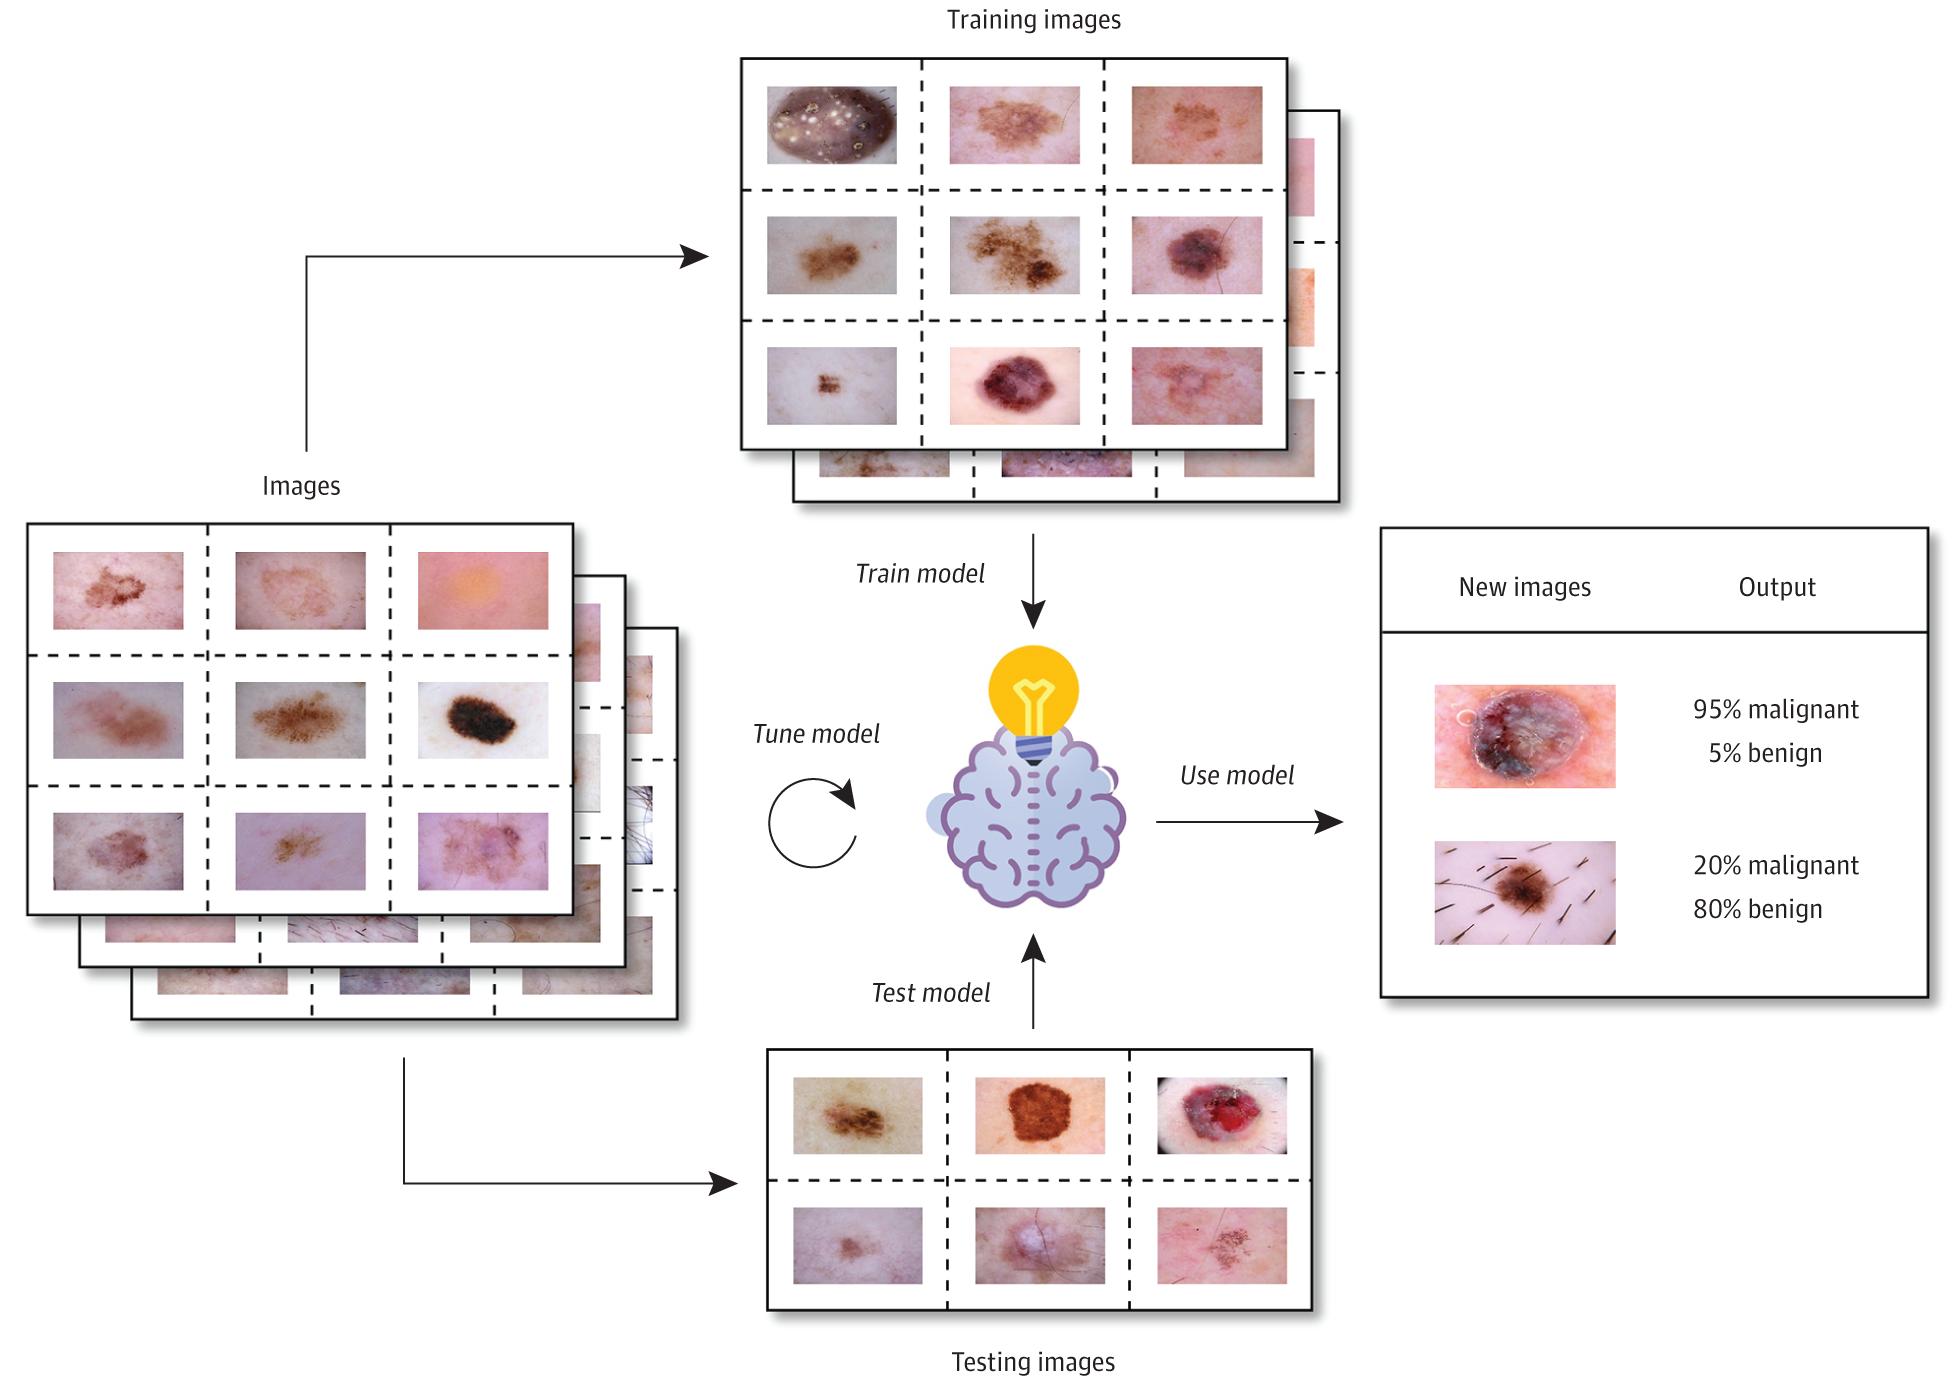 Imaging in Dermatology